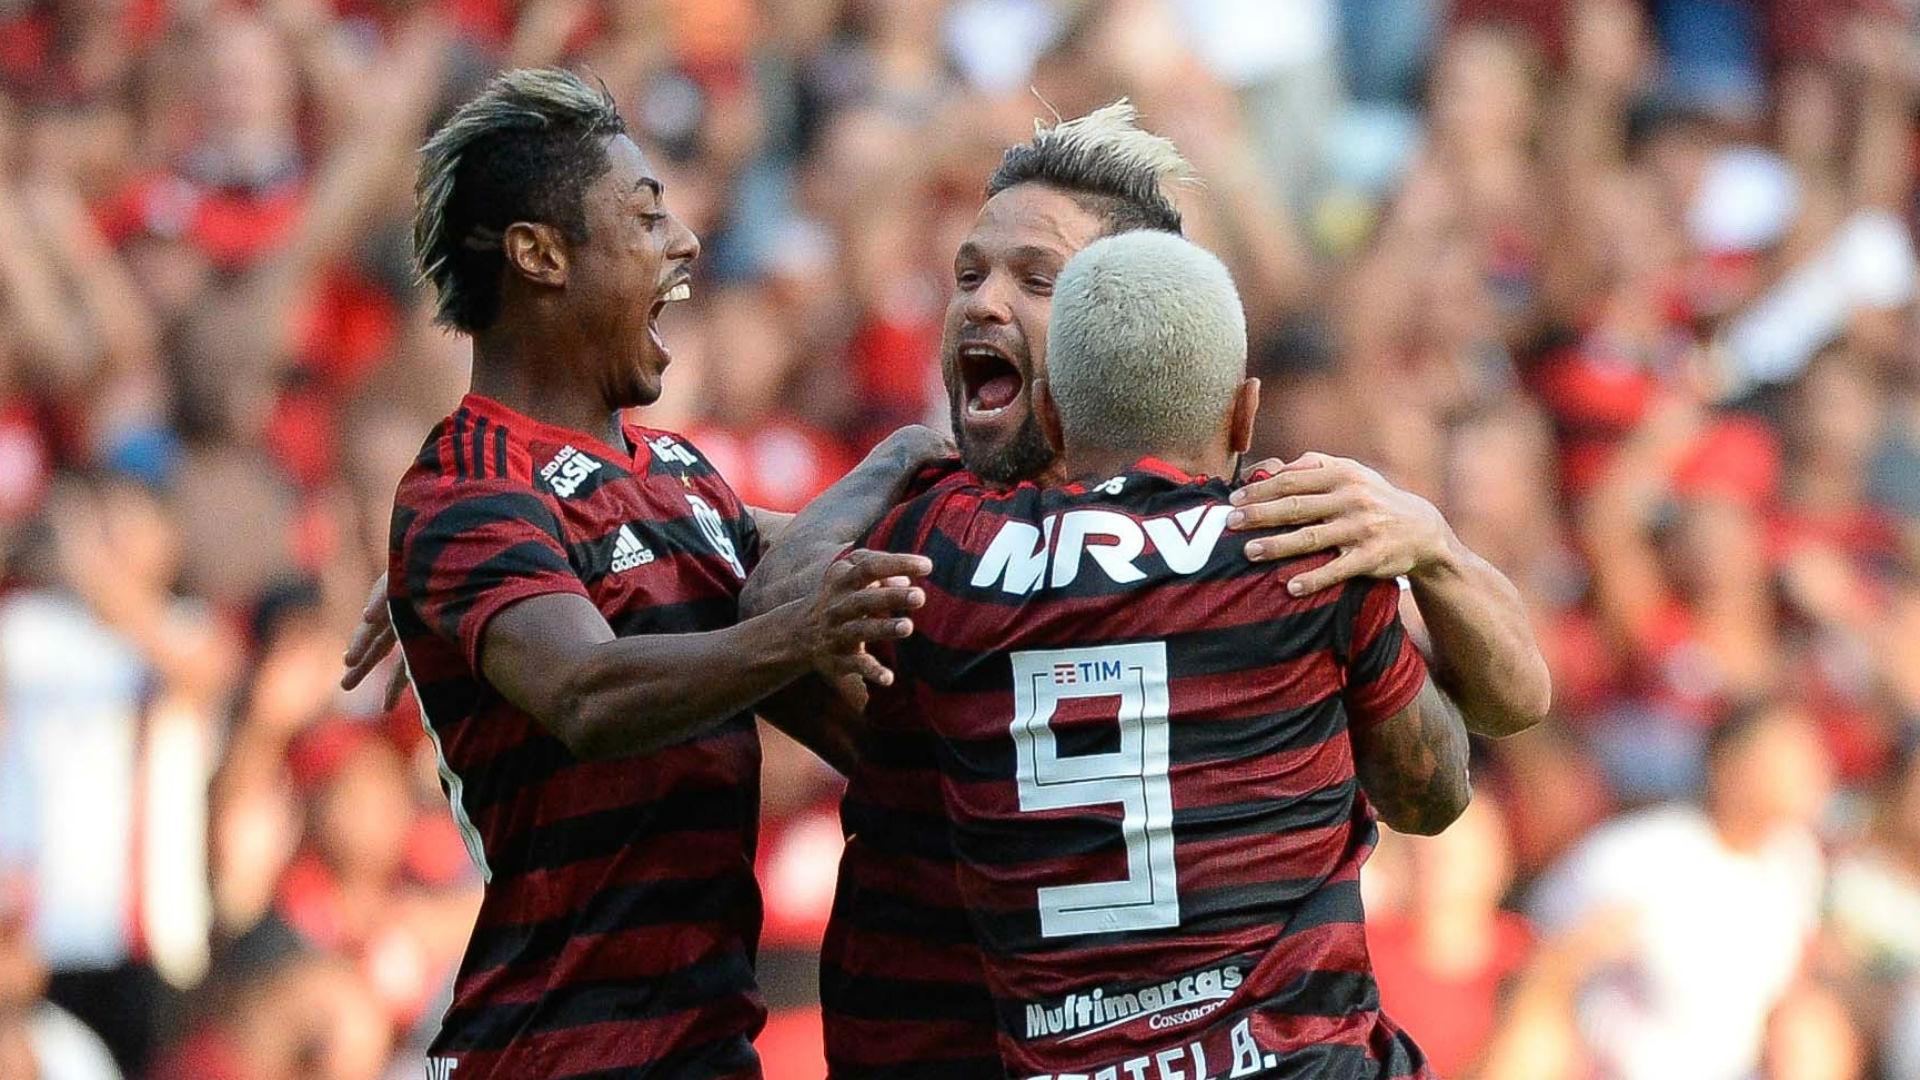 Bruno henrique Gabigol Diego Flamengo Fluminense Carioca 24 03 2019